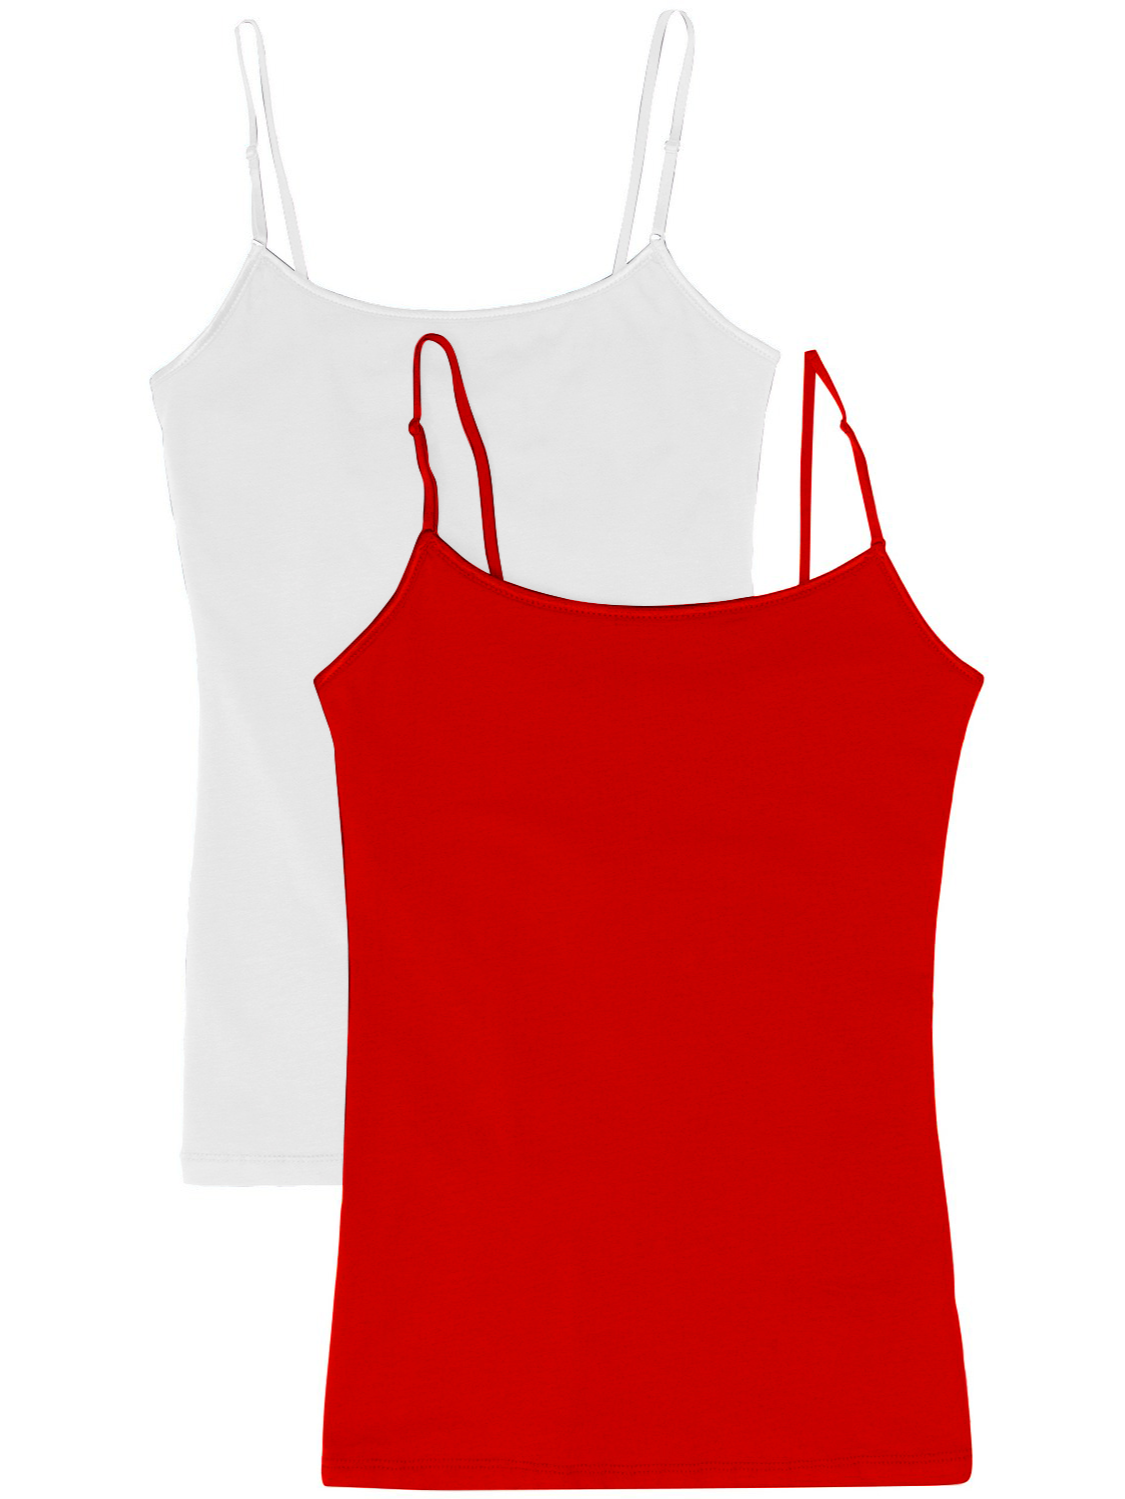 Women Camisole with Built in Shelf Bra Adjustable Spaghetti Strap Vest Tank Tops